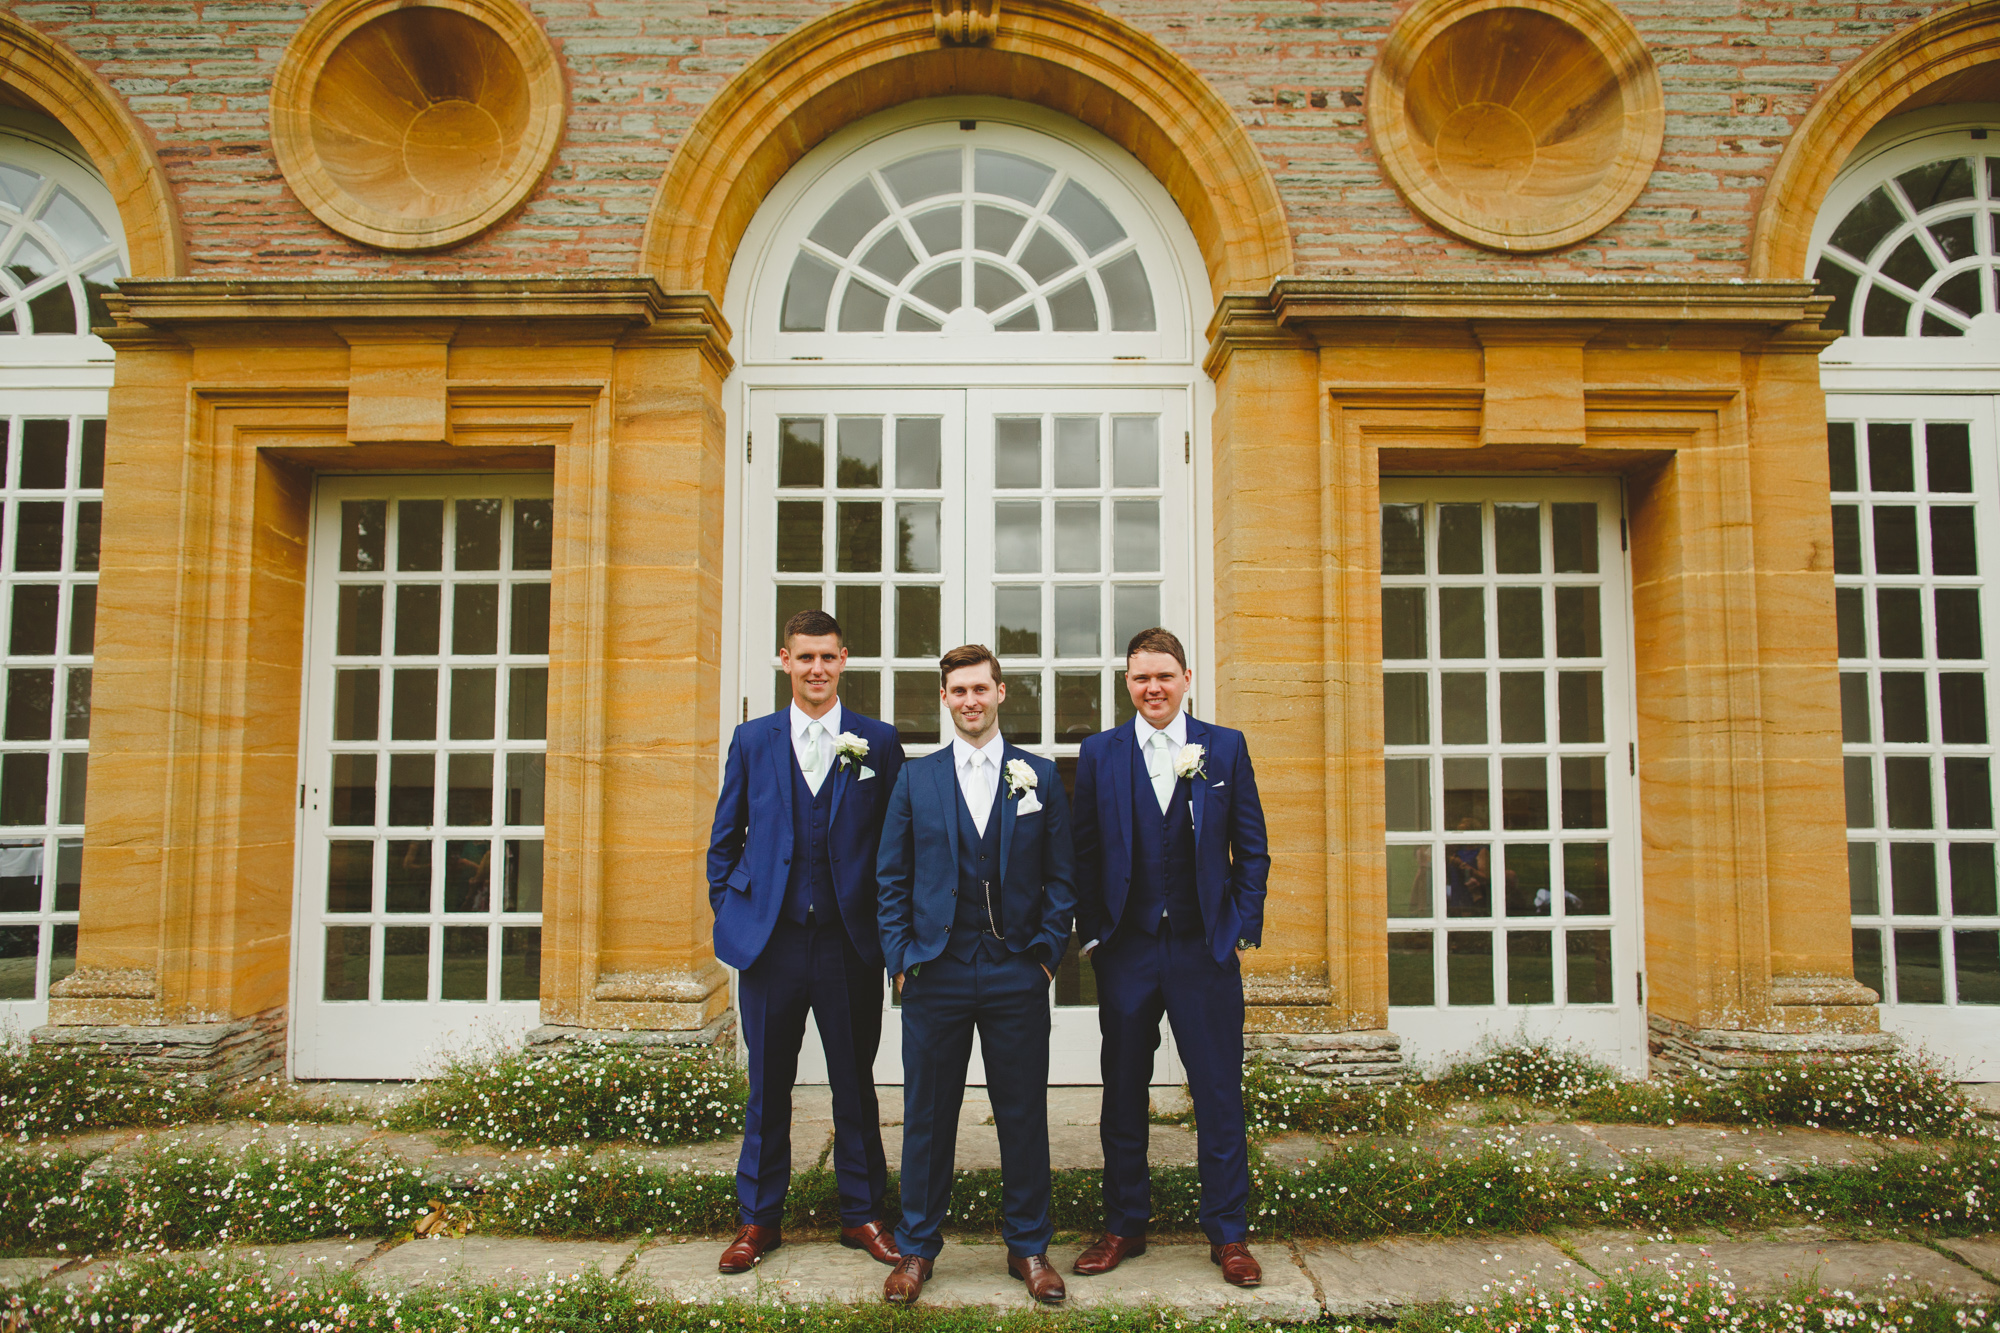 hestercombe-taunton-wedding-photography-camera-hannah-11.jpg